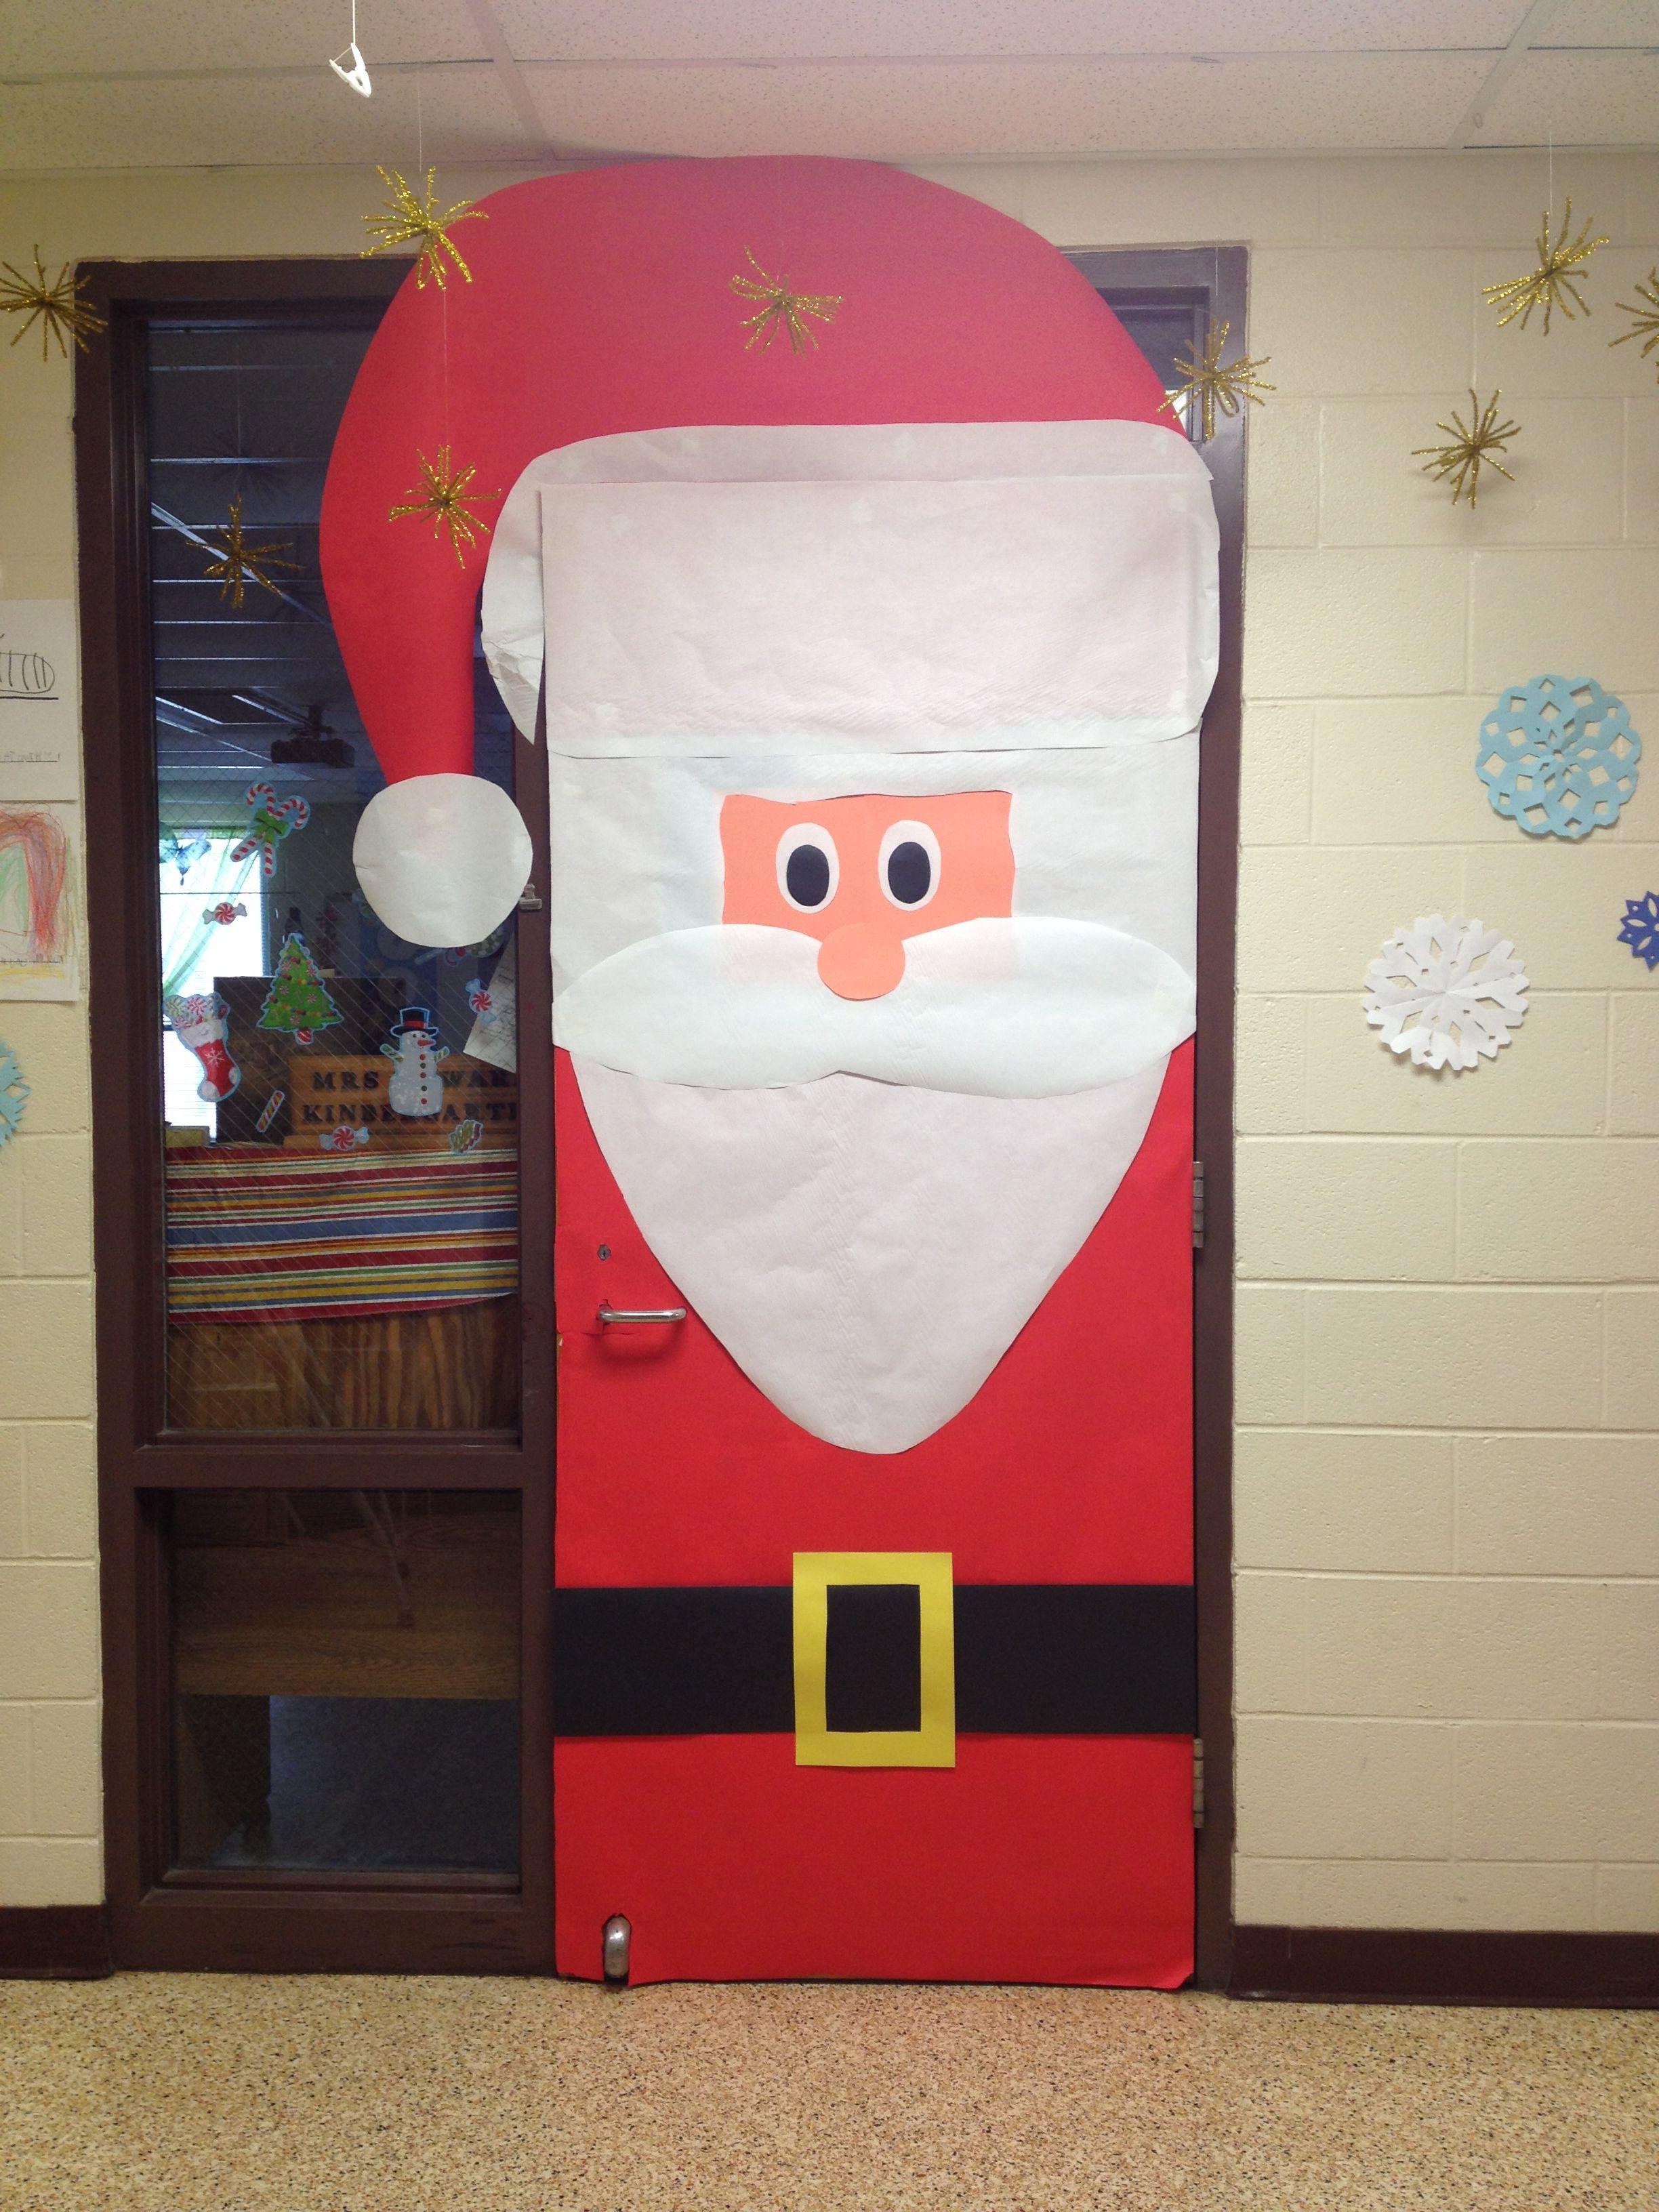 Christmas Classroom Door Decoration Santa Christmas Classroom Door Door Decorations Classroom Christmas Door Decorations